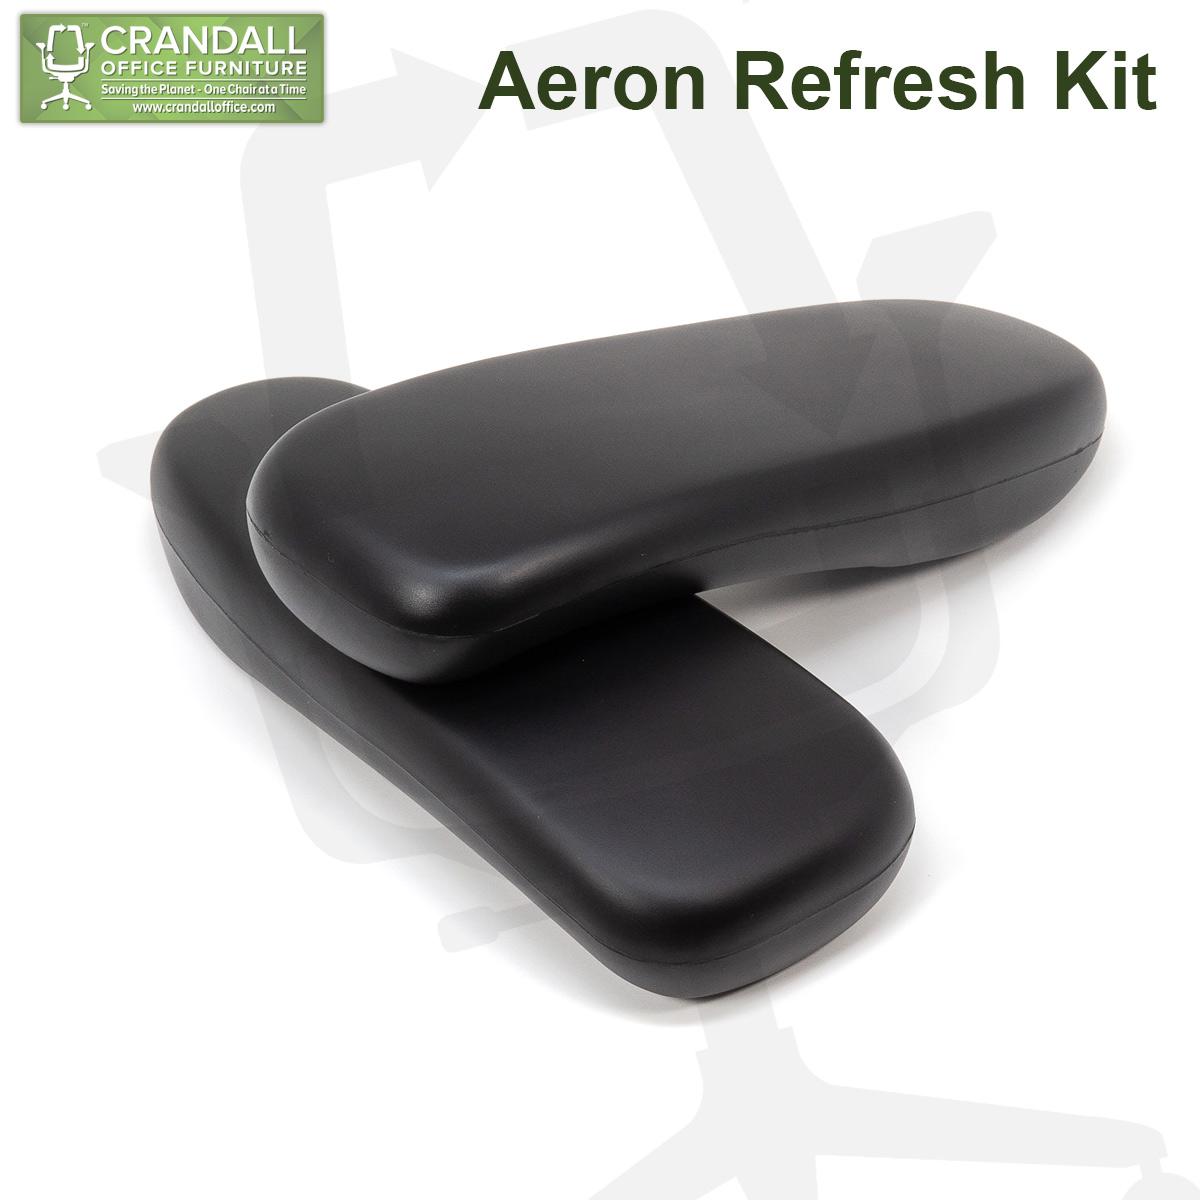 Crandall-Office-Herman-Miller-Aeron-Refresh-Kit-0002